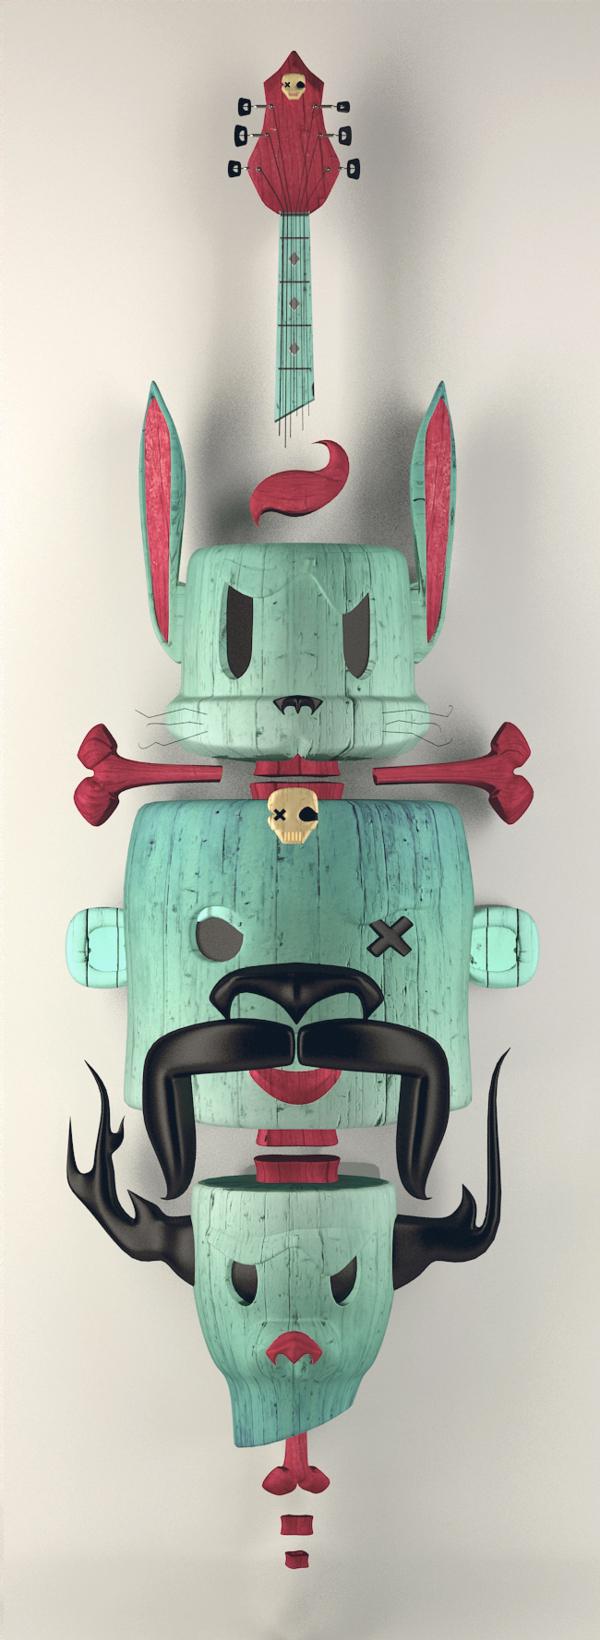 ilustraciones urkin skateboards